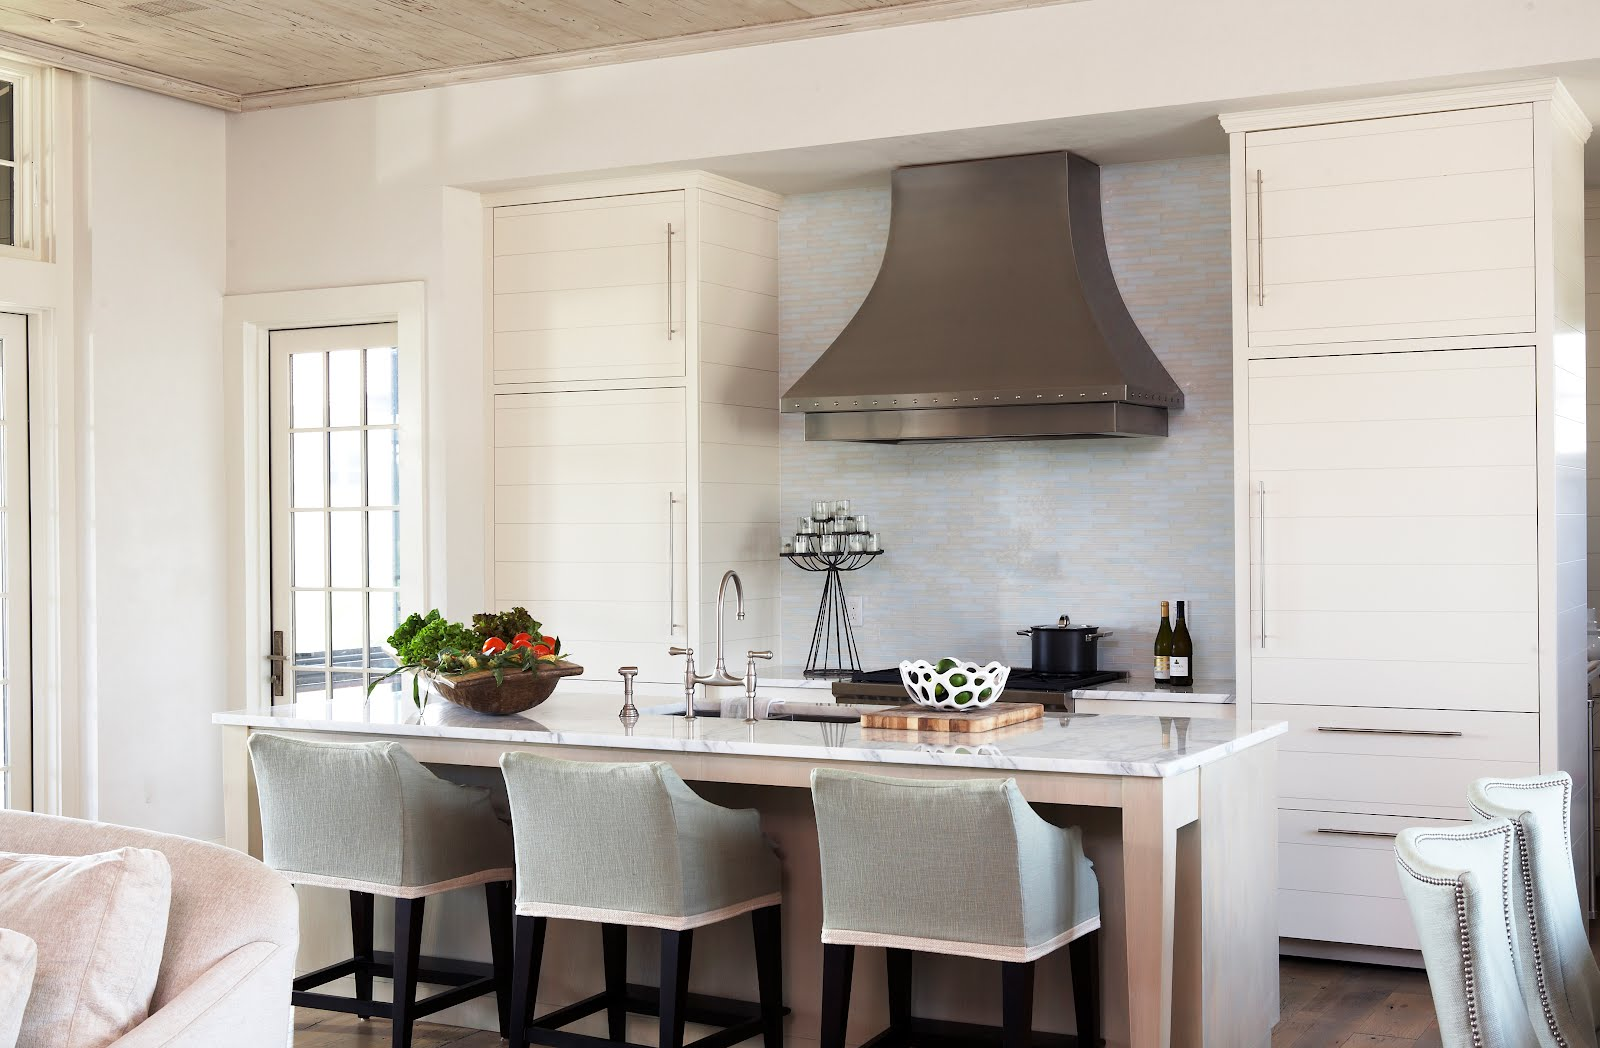 COCOCOZY: February 2012 - White Beach House Kitchen